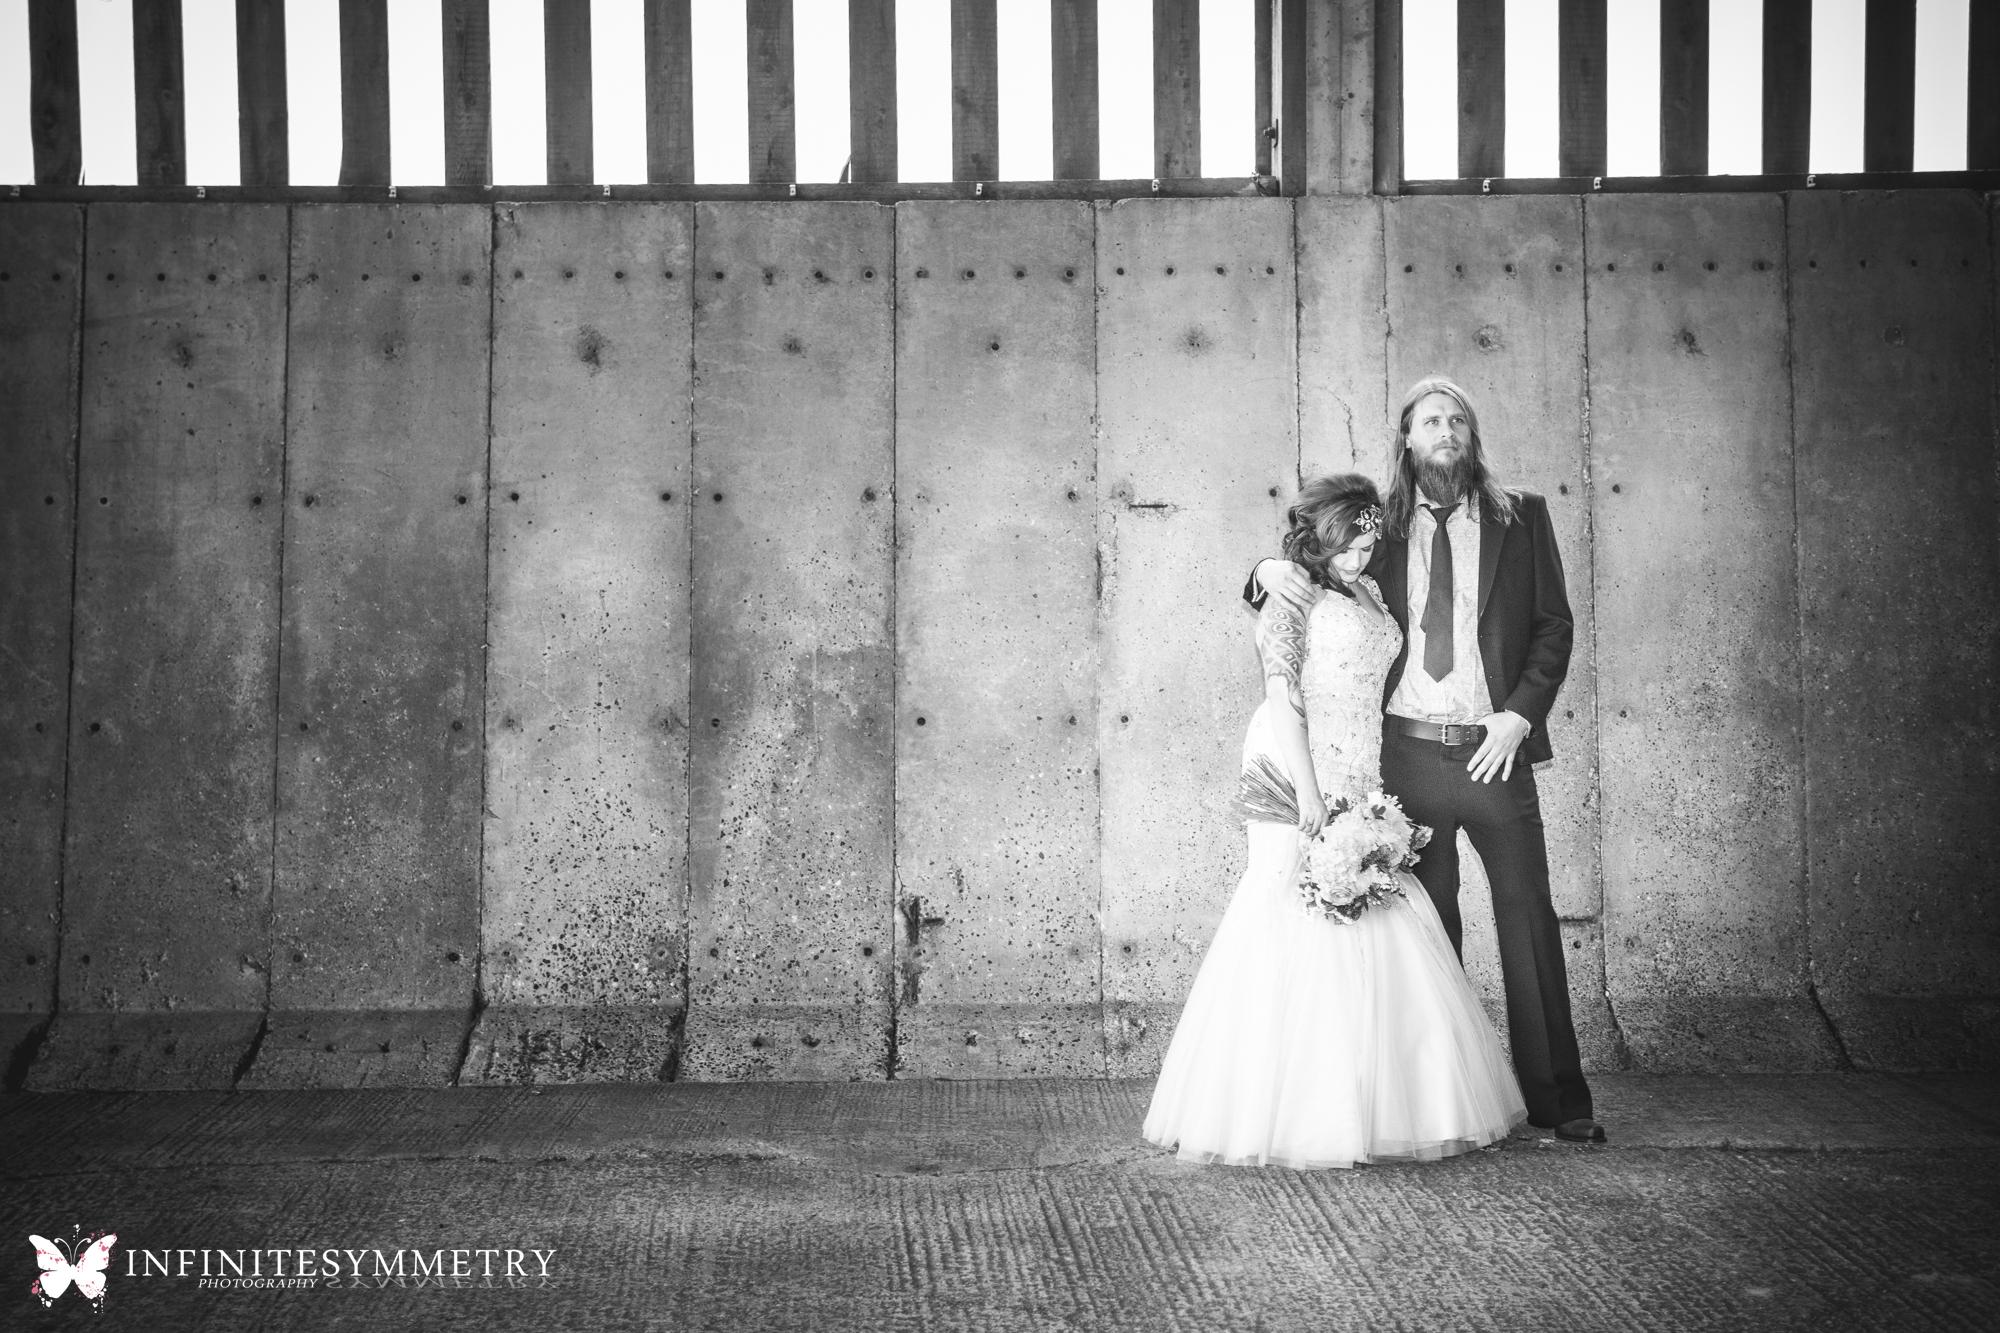 Infinite Symmetry Wedding Photography